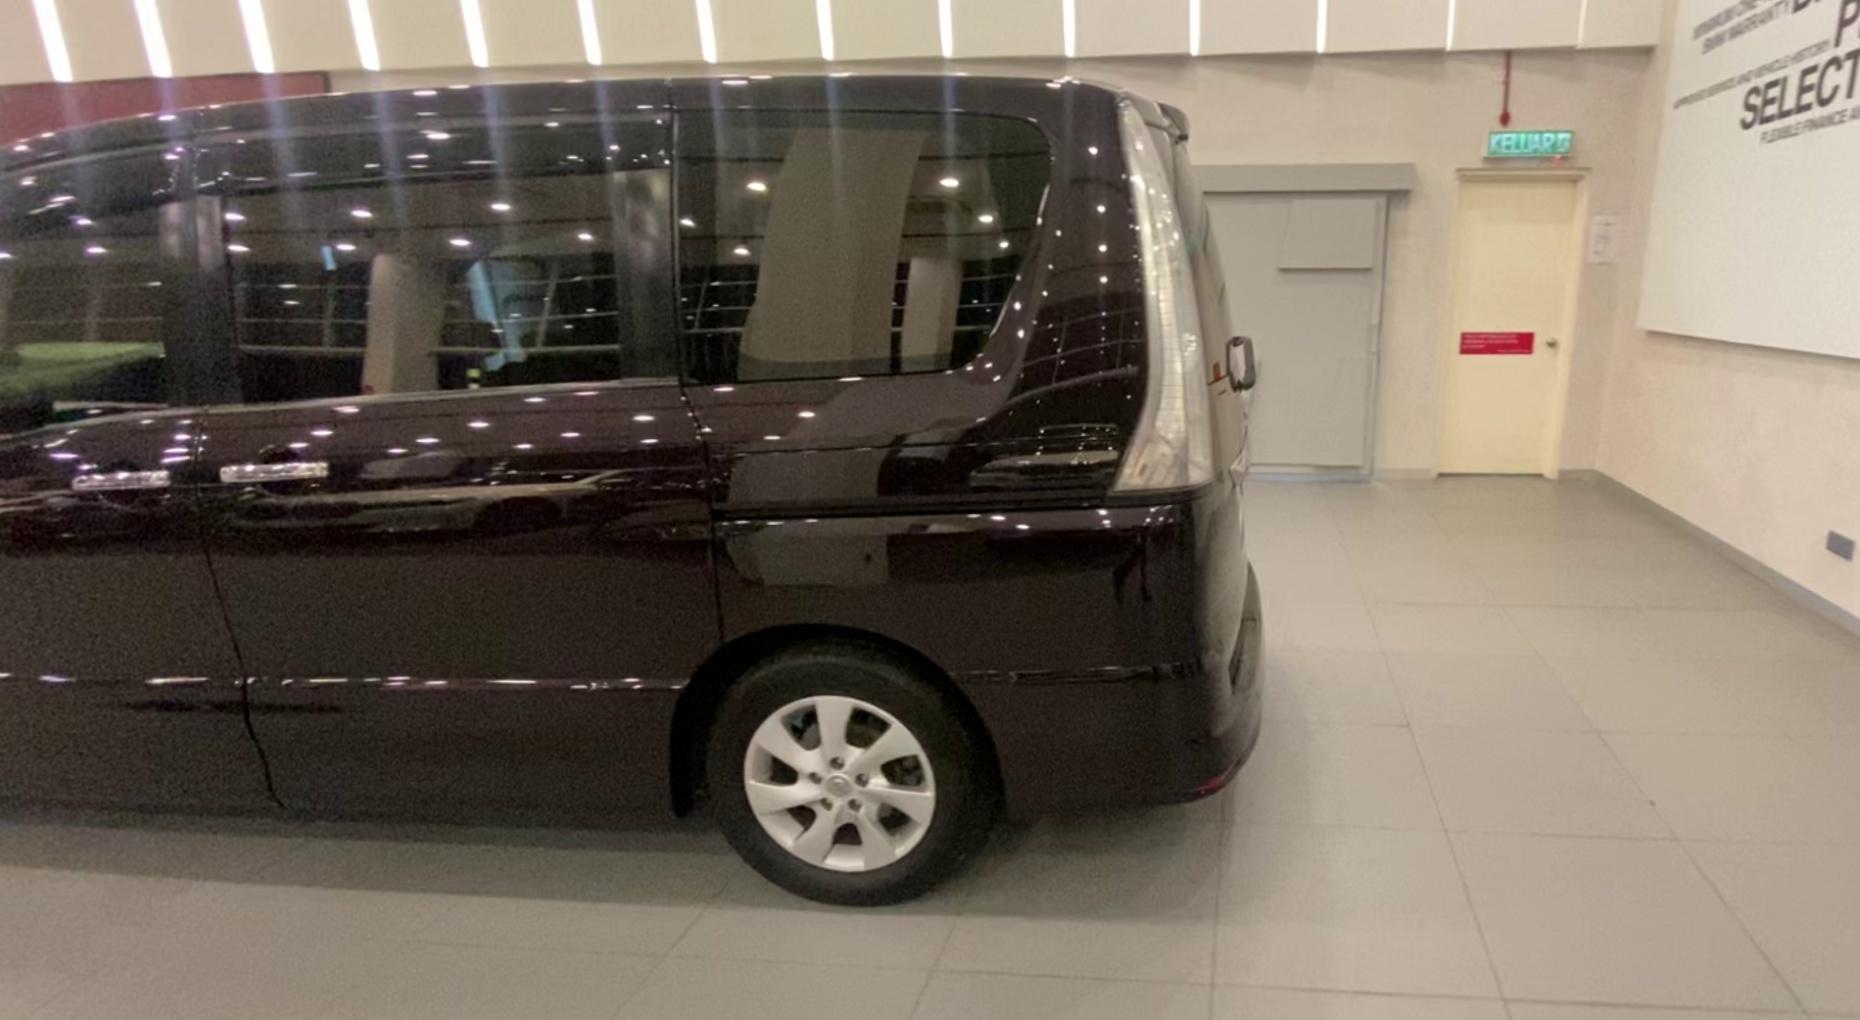 2013 Nissan Serena 2.0L CVT H/Star S-Hybrid